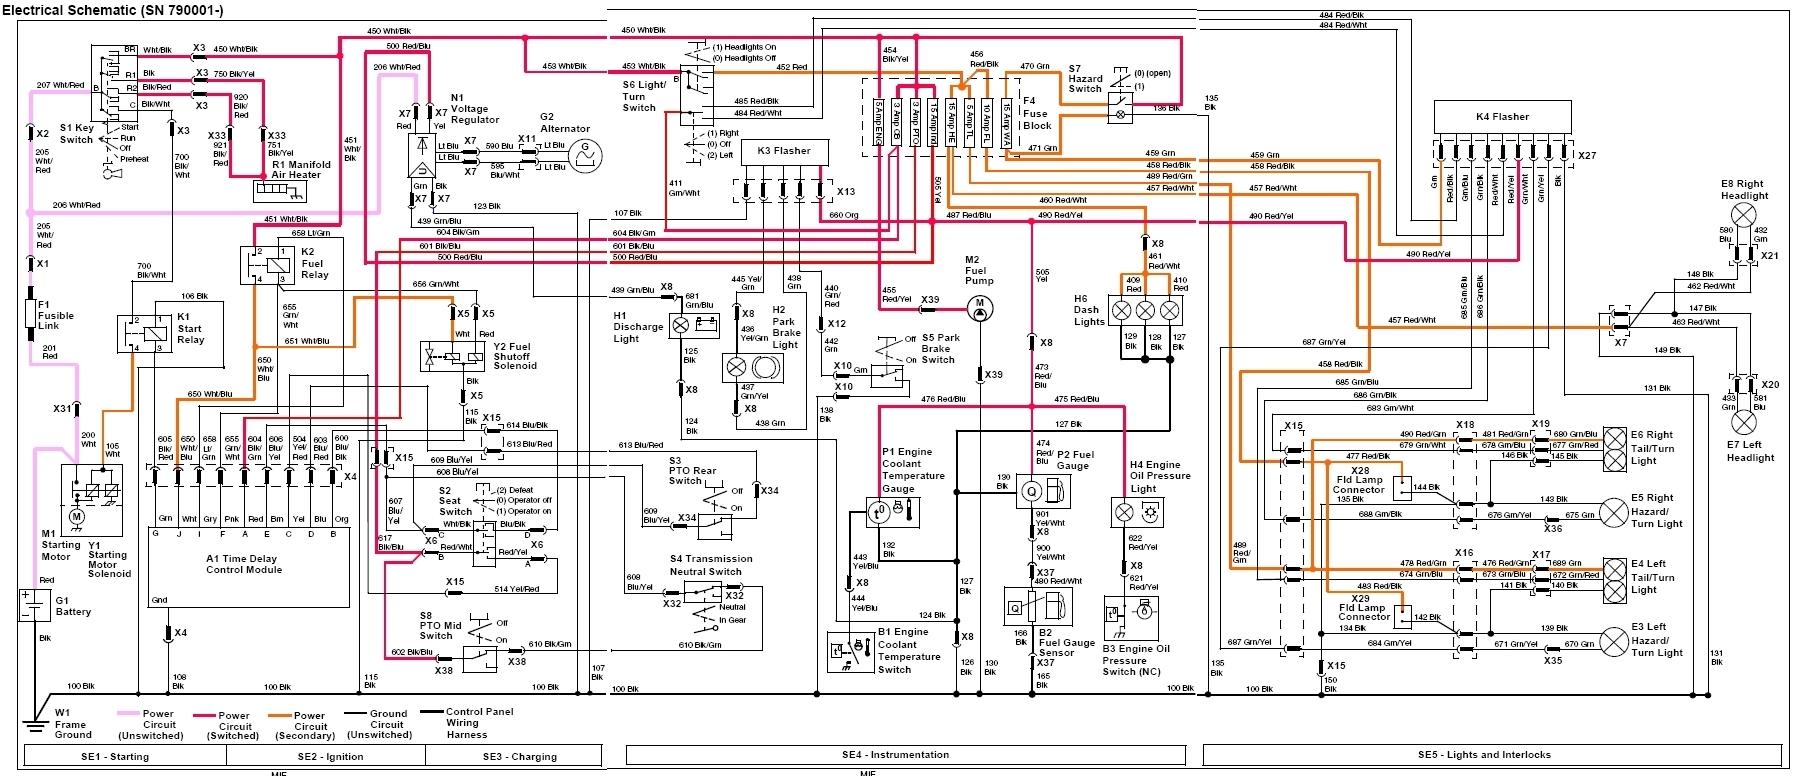 [DIAGRAM_1CA]  VO_6771] John Deere 4440 Wiring Diagram Free Picture Free Diagram | Wiring Schematic For 4440 John Deere |  | Vell Aeocy Pneu Vira Mohammedshrine Librar Wiring 101